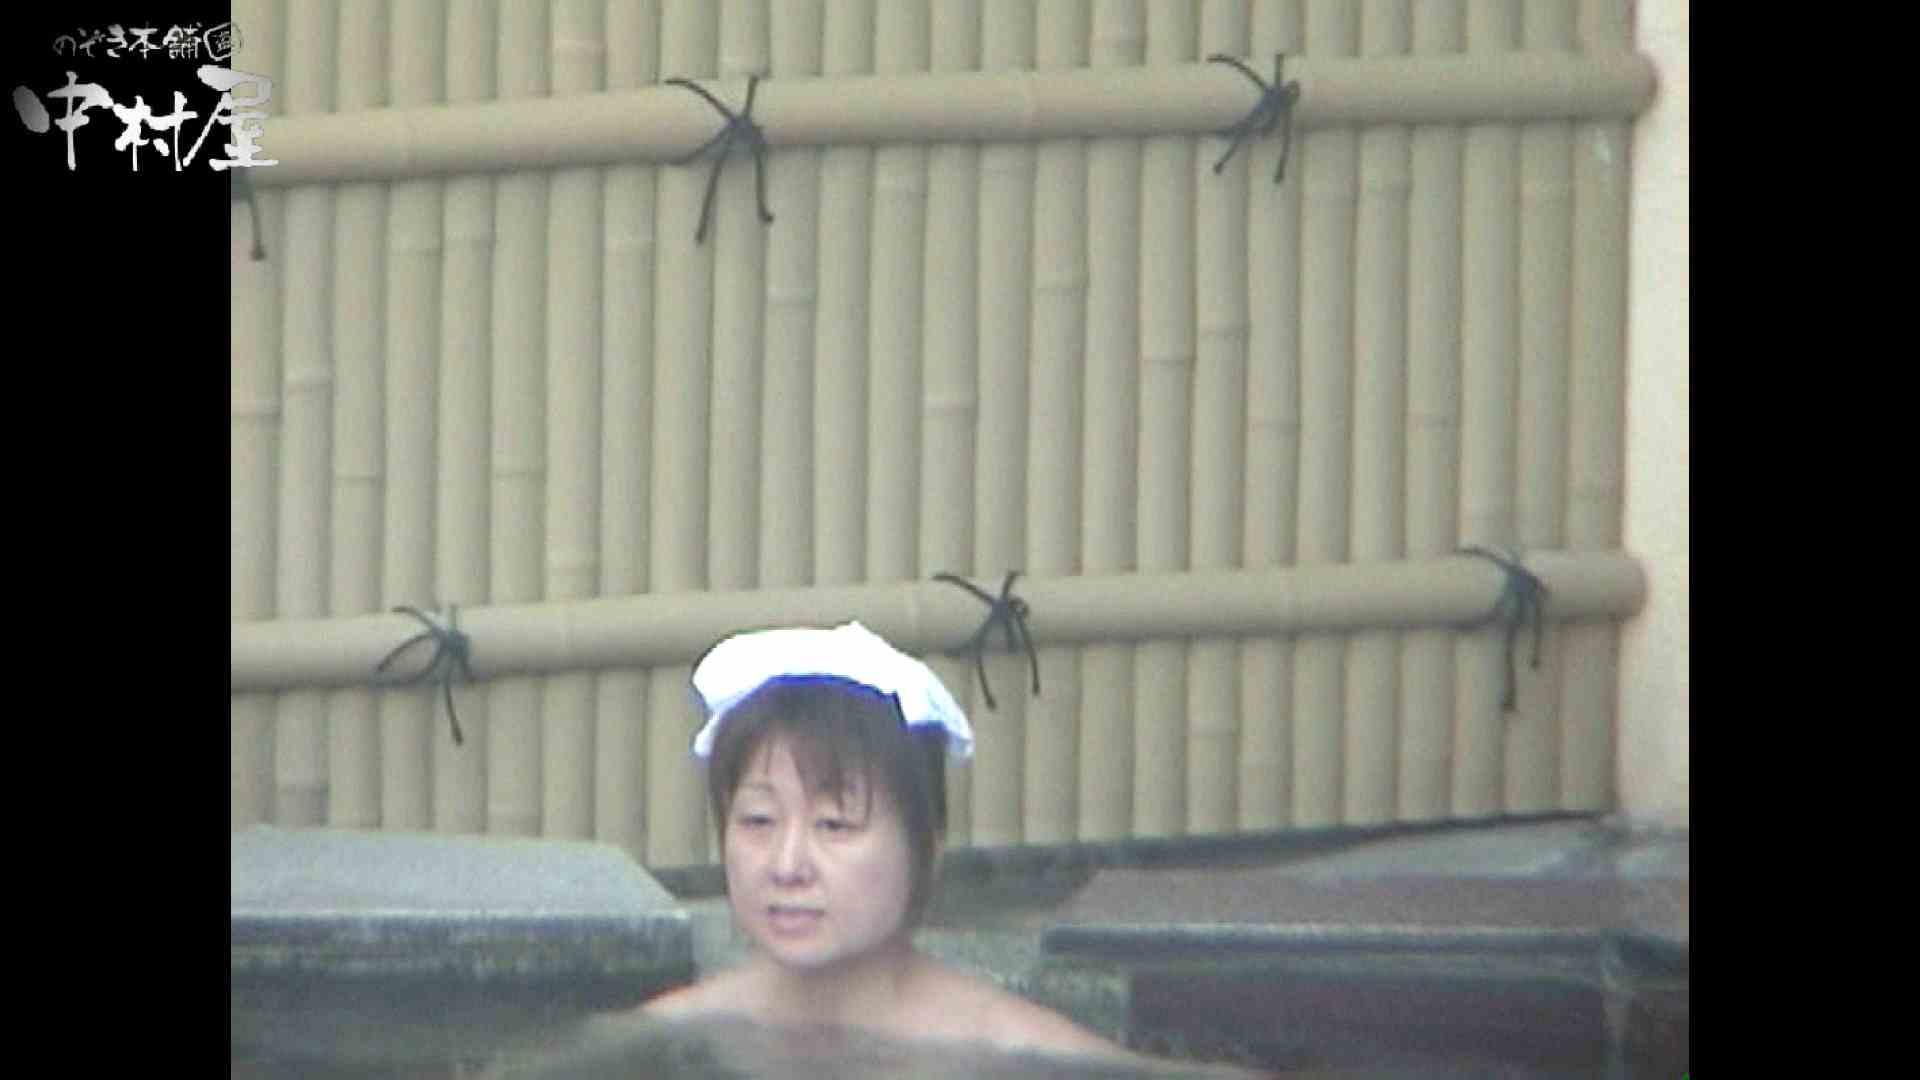 Aquaな露天風呂Vol.958 0  40連発 2